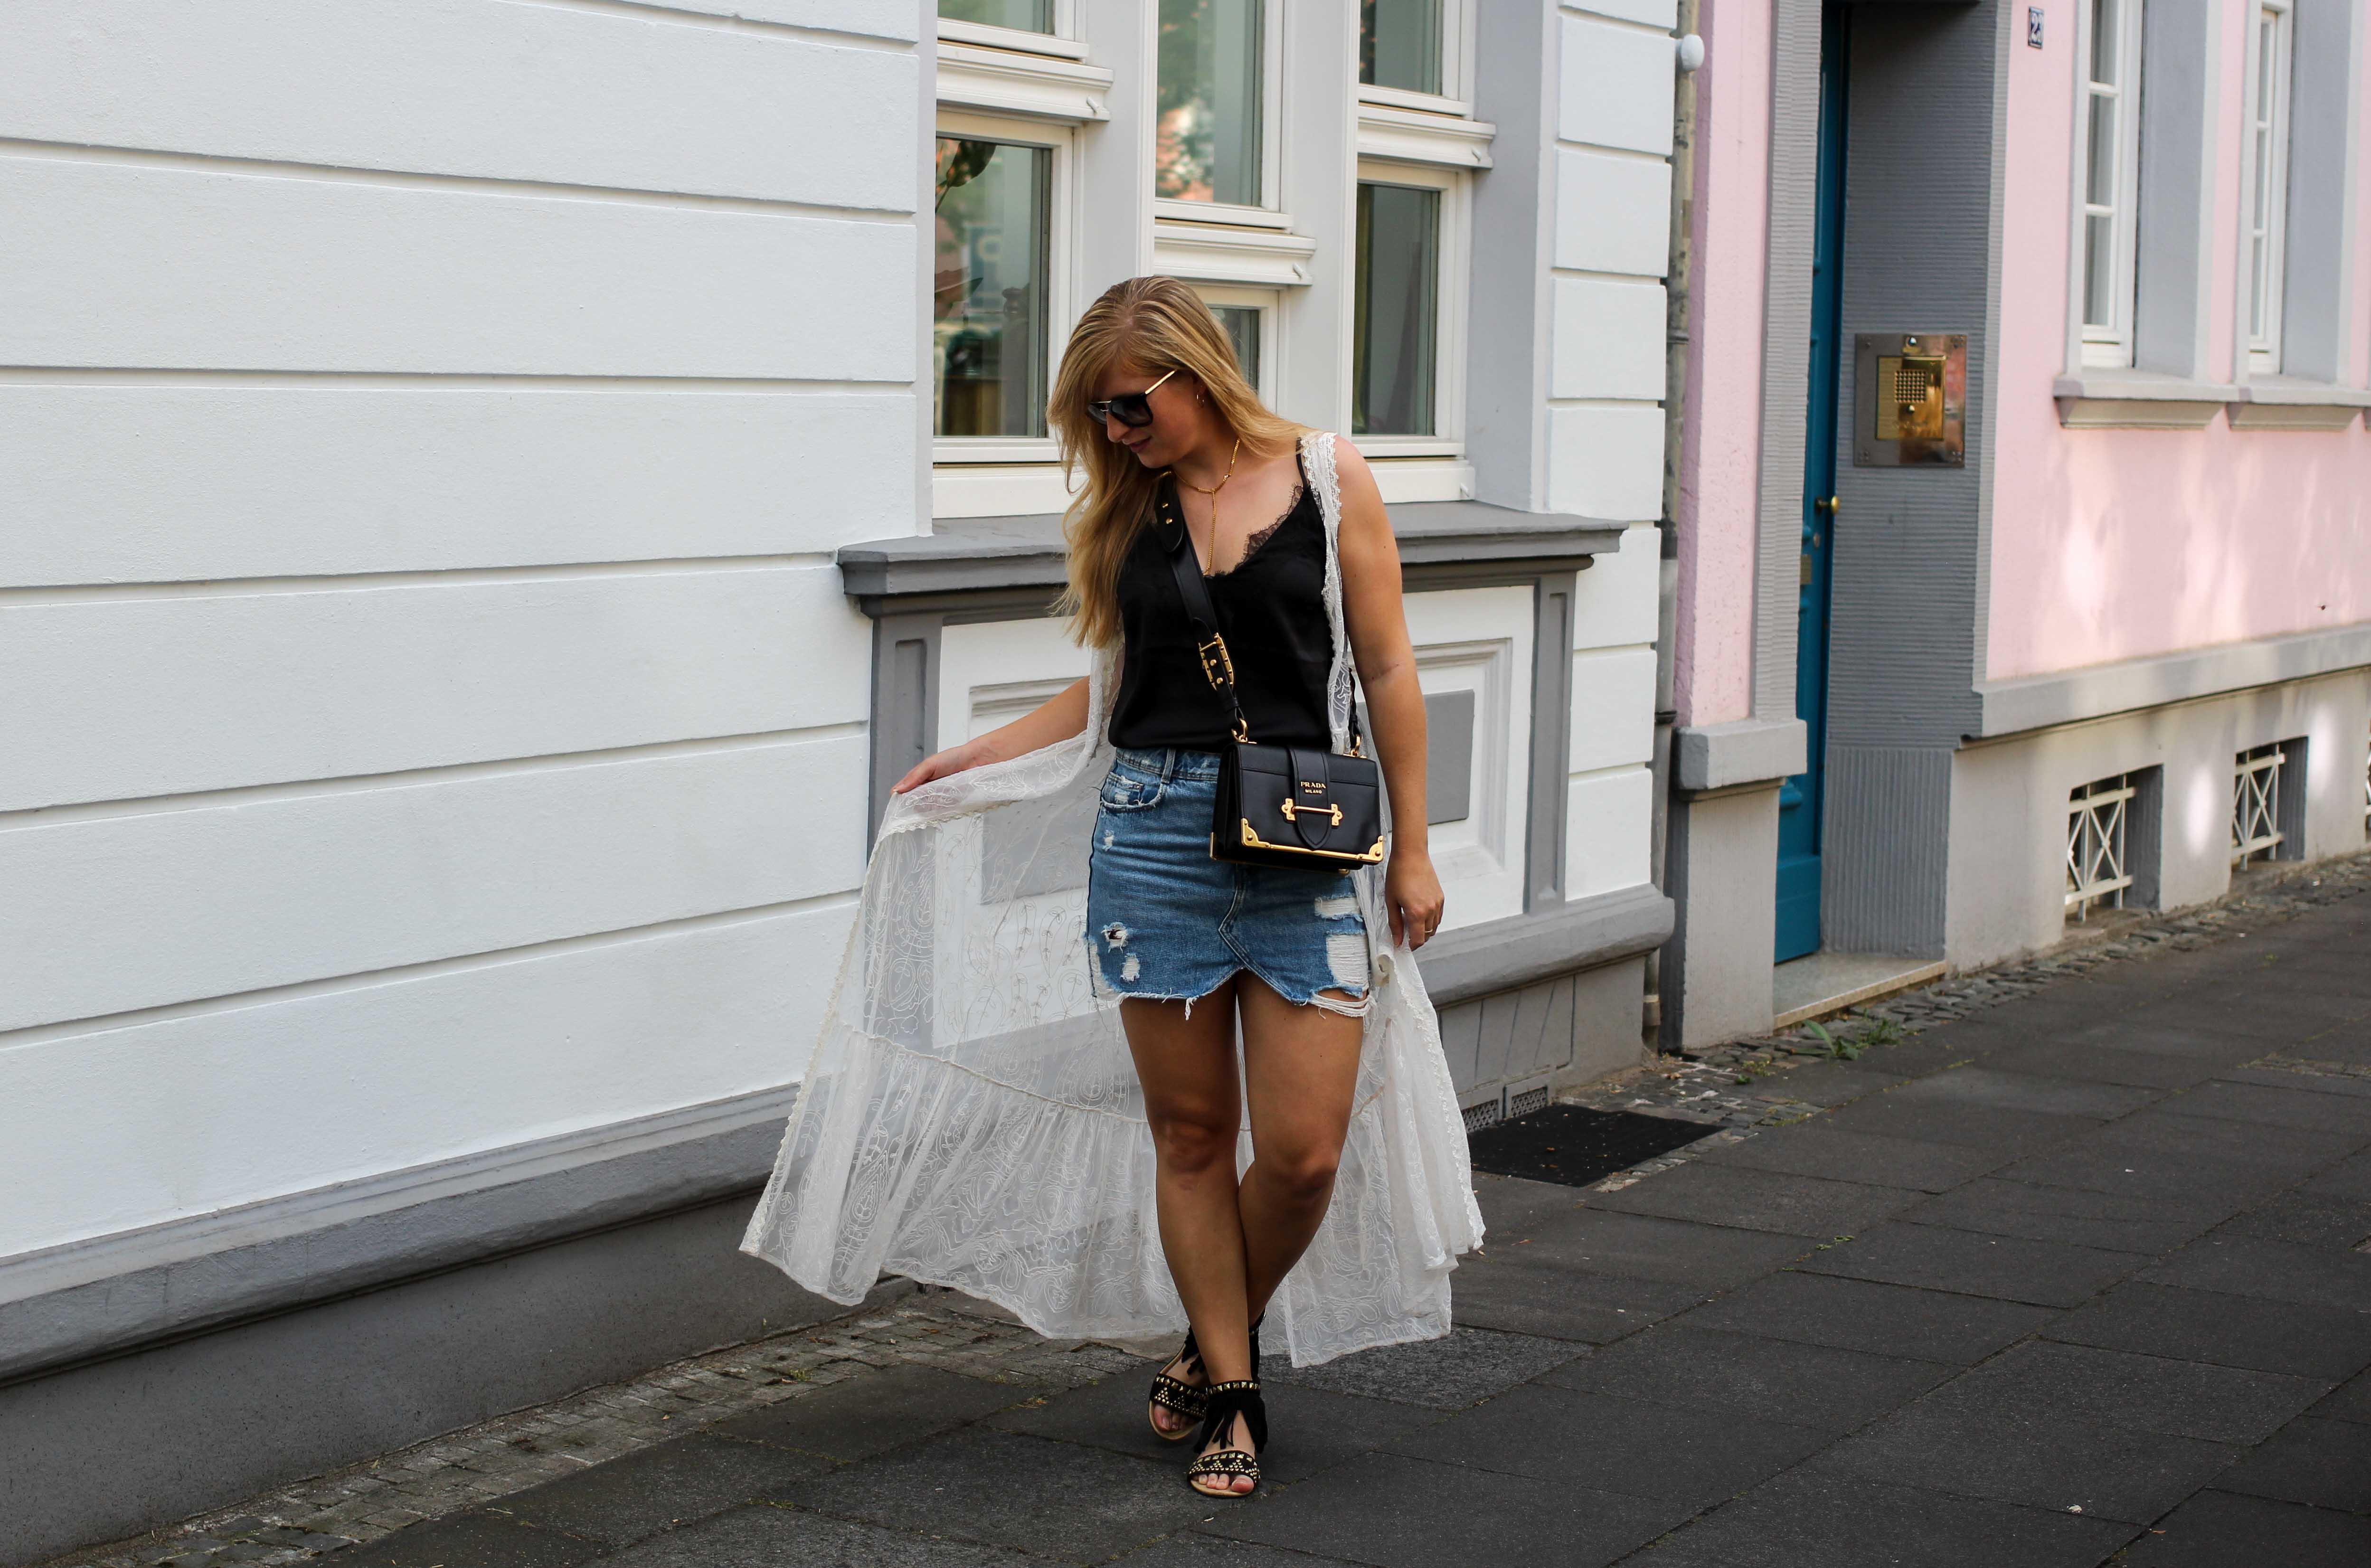 Spitzentop Jeansrock Boho Sommermantel Boho Sommerlook kombinieren Ibiza Style Hippie Modeblog Outfit Prada Cahier Schwarz Gold 7